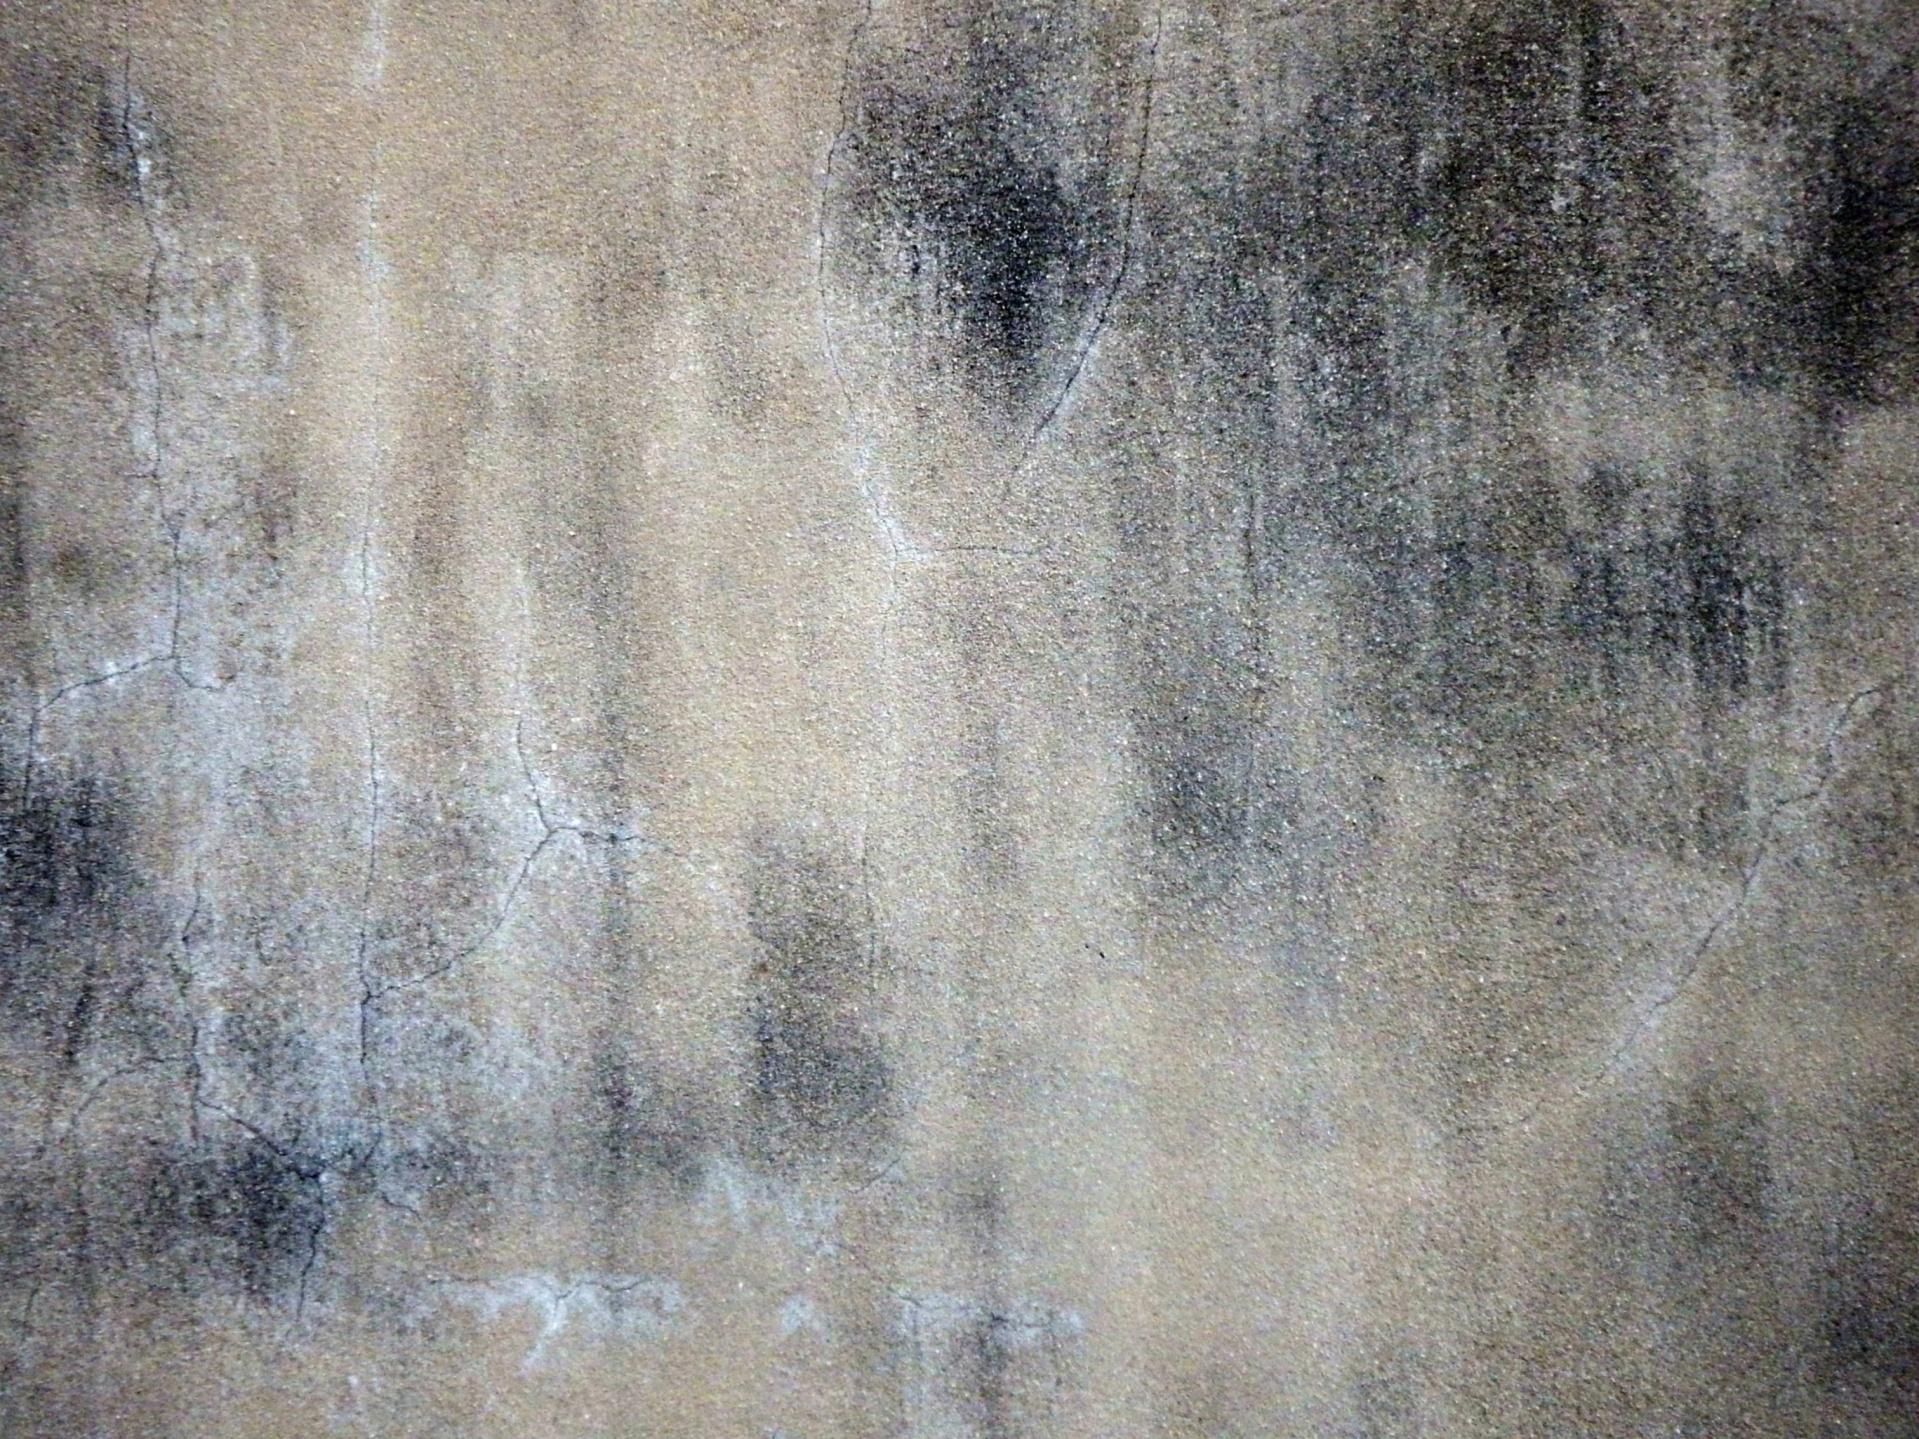 Dark Grey Concrete Texture Free Stock Photo - Public Domain Pictures